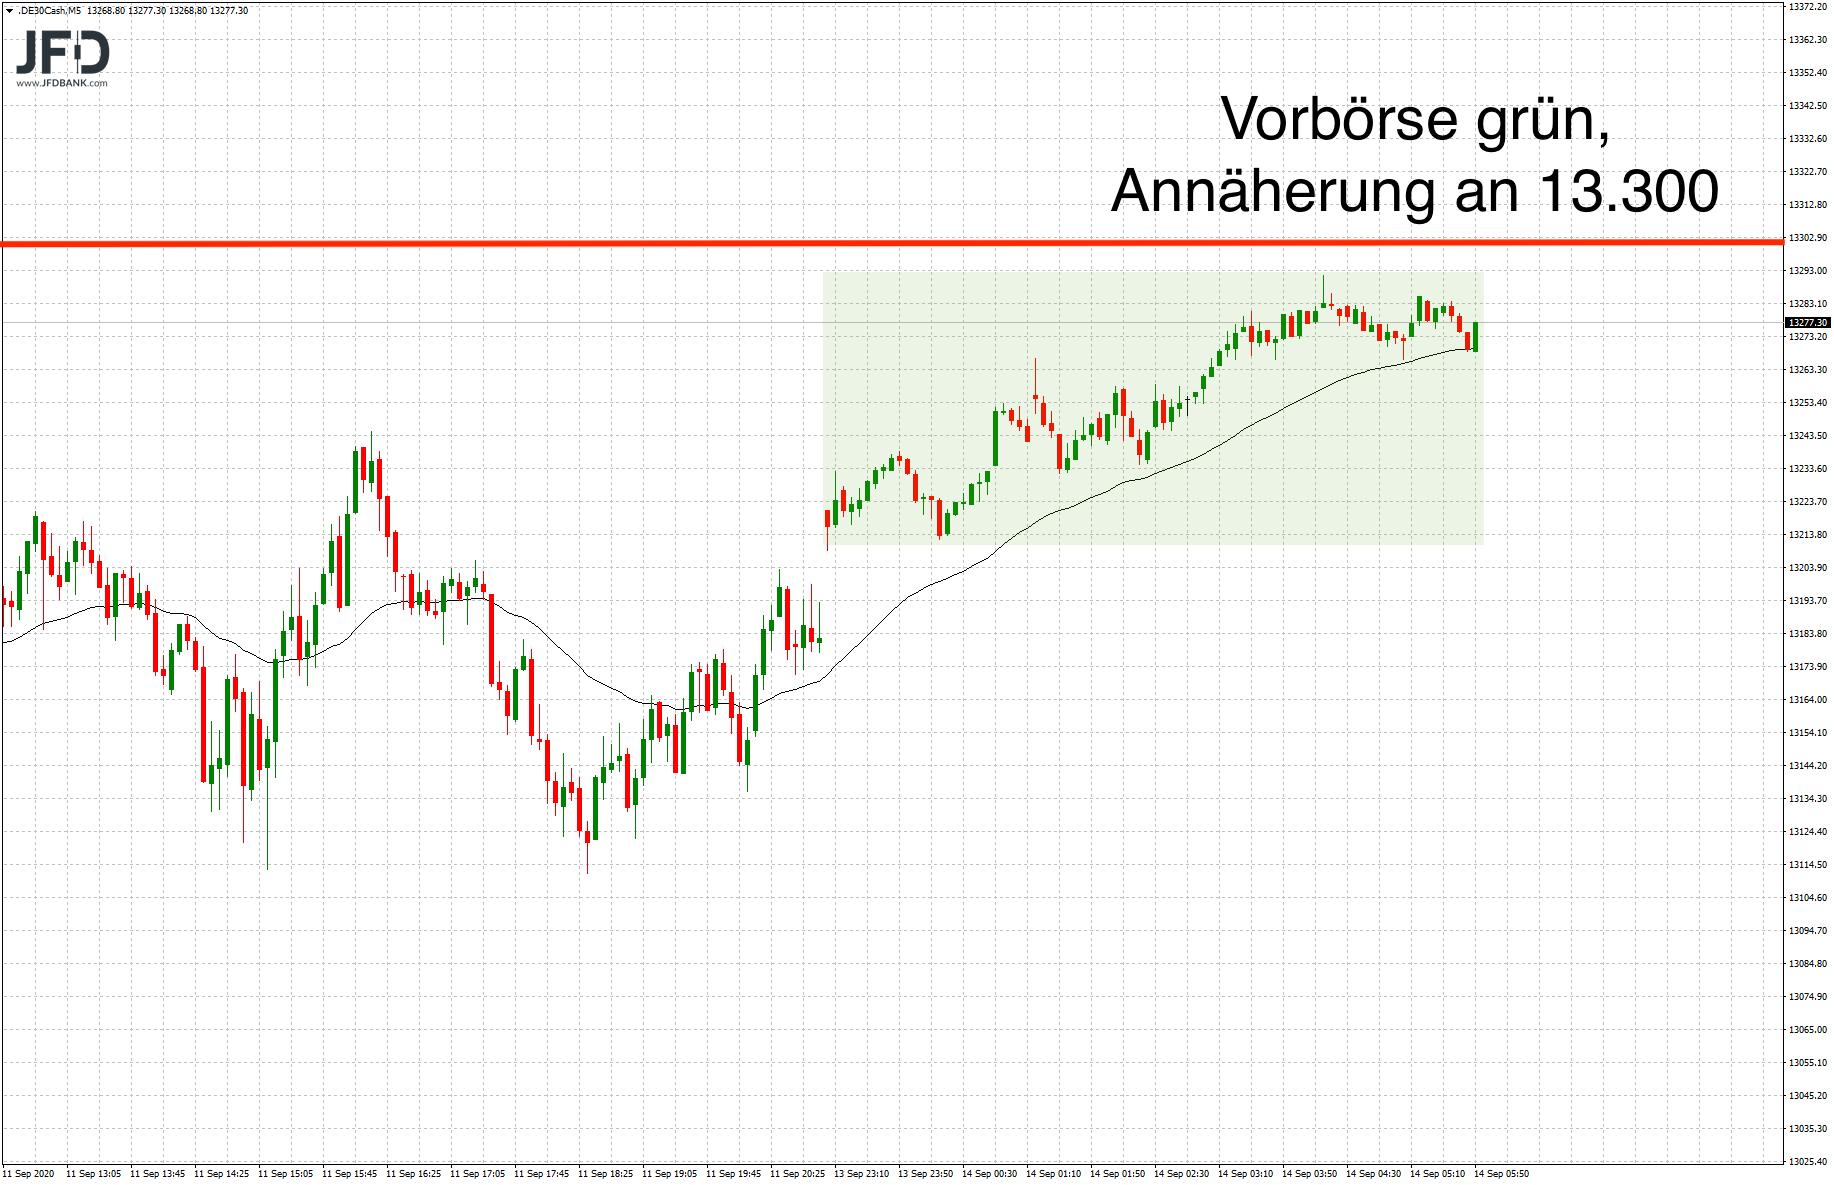 Wochenstart-im-DAX-erneut-unter-Volldampf-Kommentar-JFD-Bank-GodmodeTrader.de-5